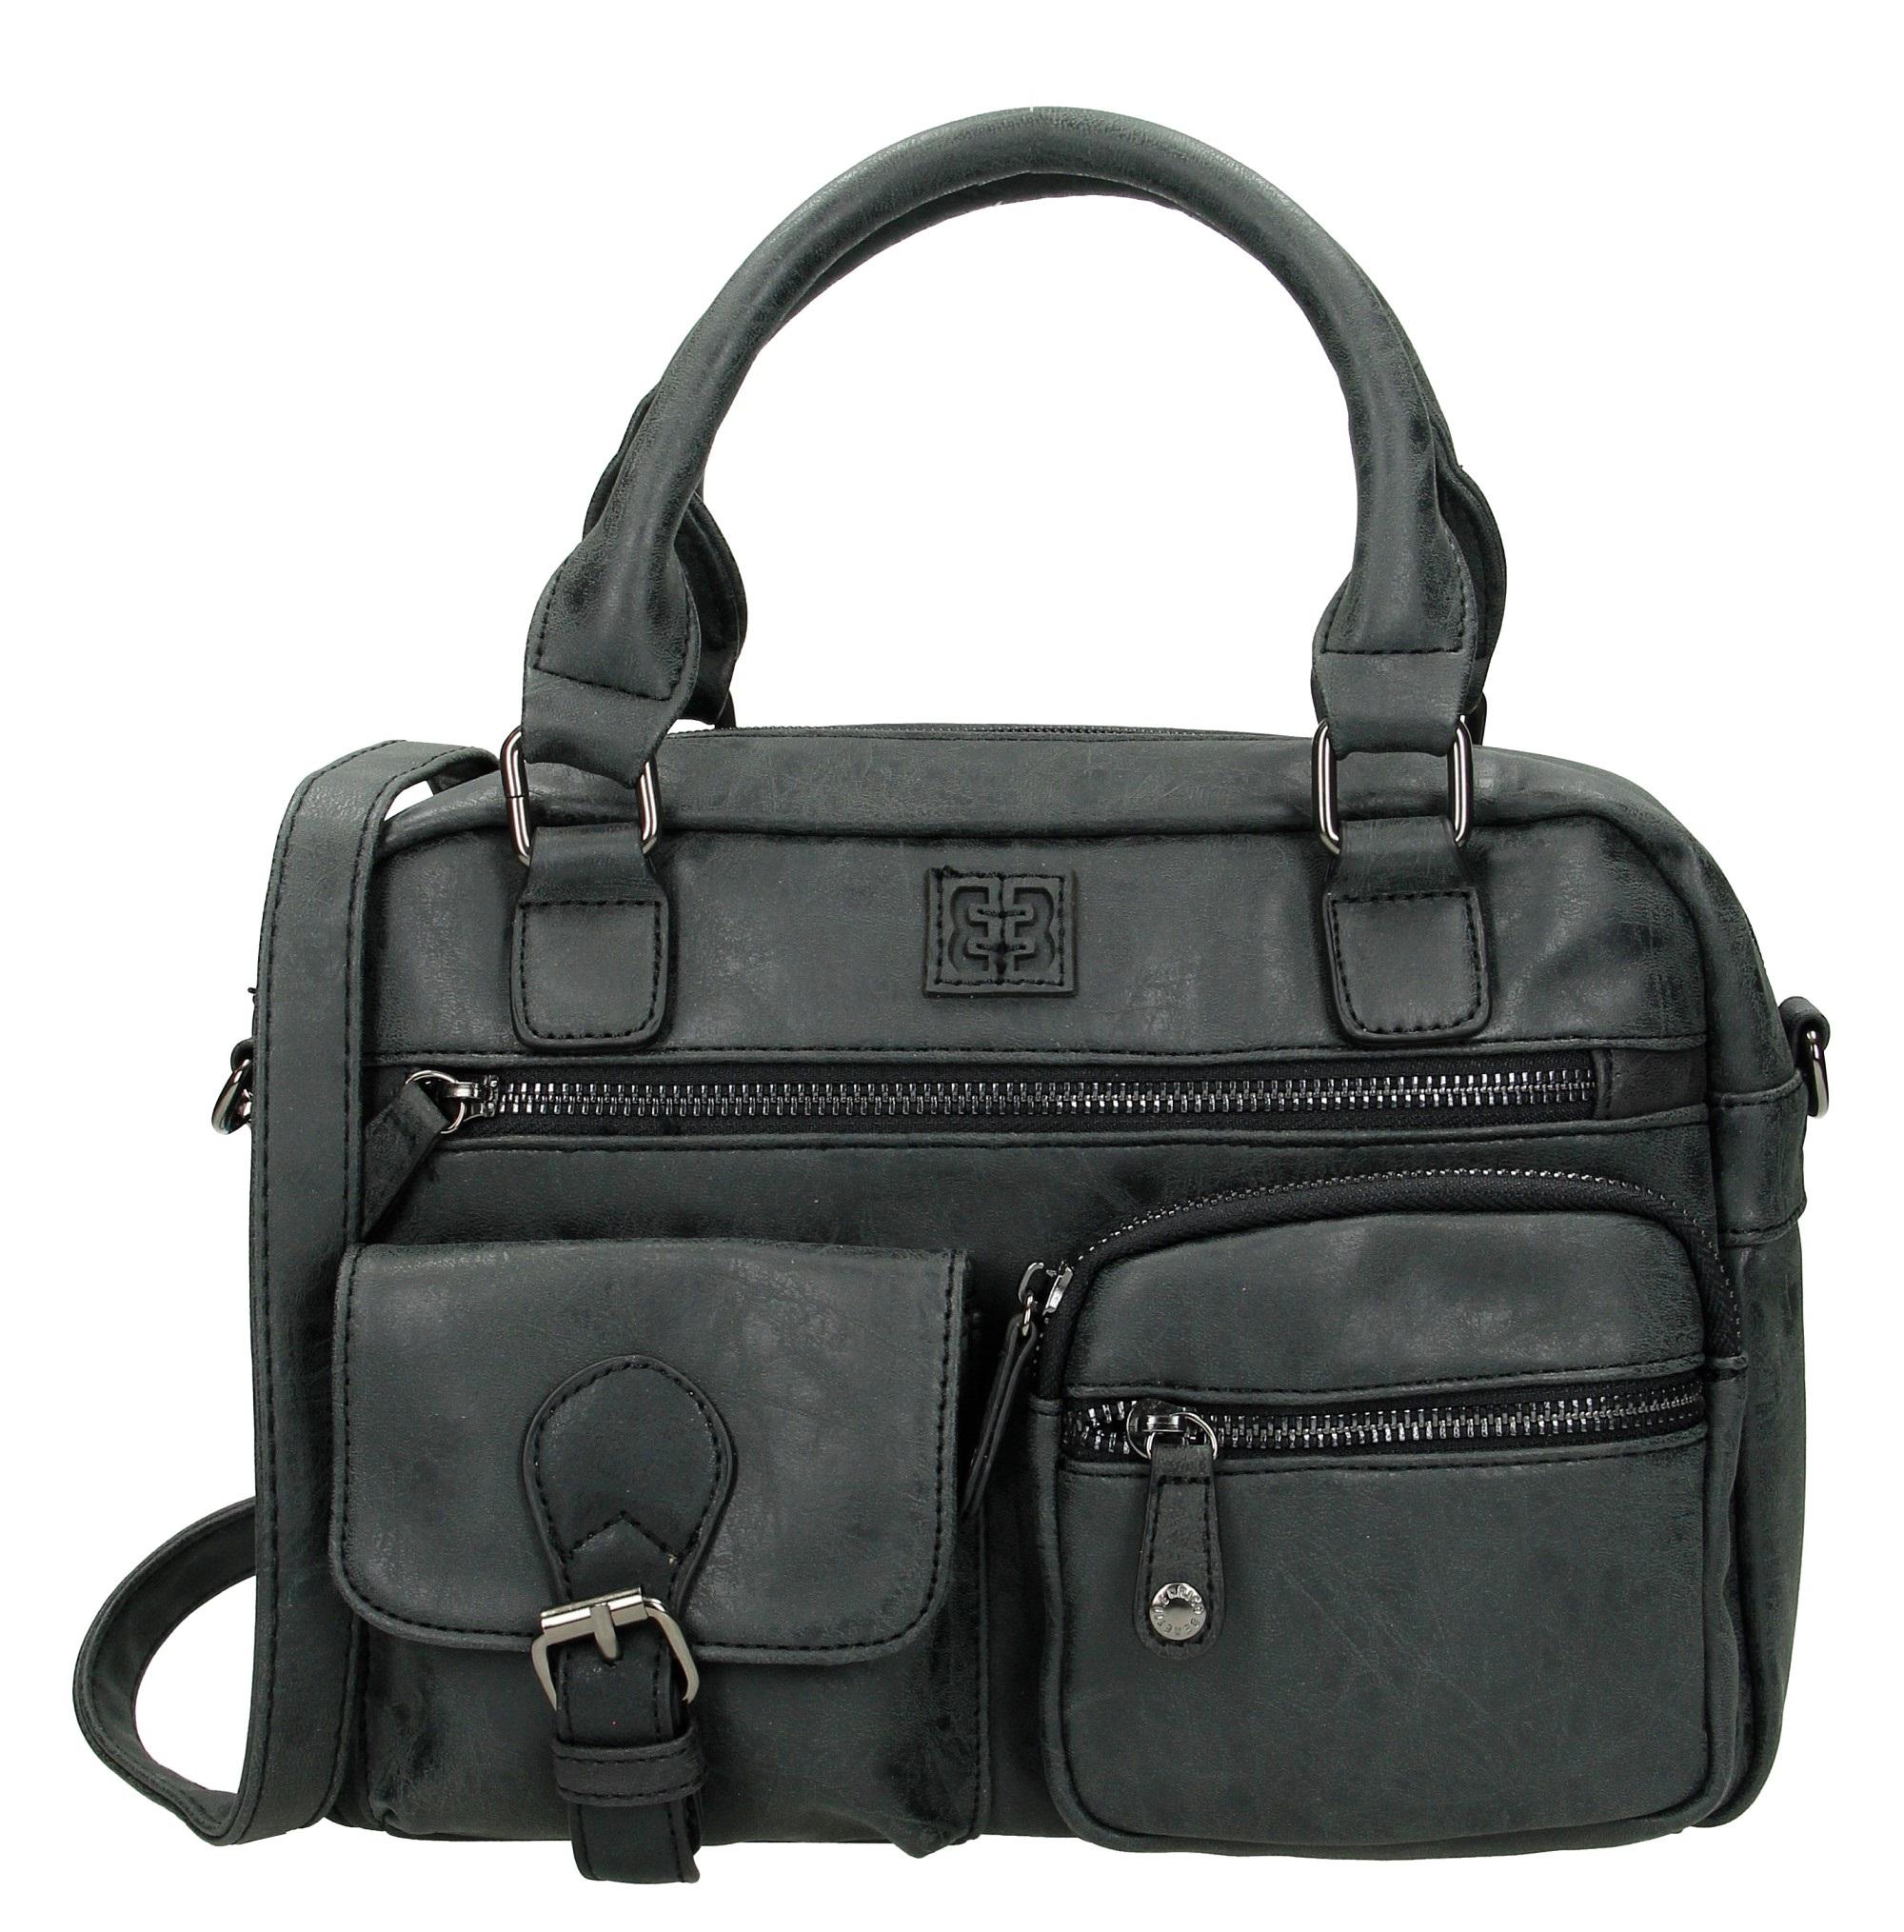 5353172800d enrico benetti dames tas zwart - JvS Bags